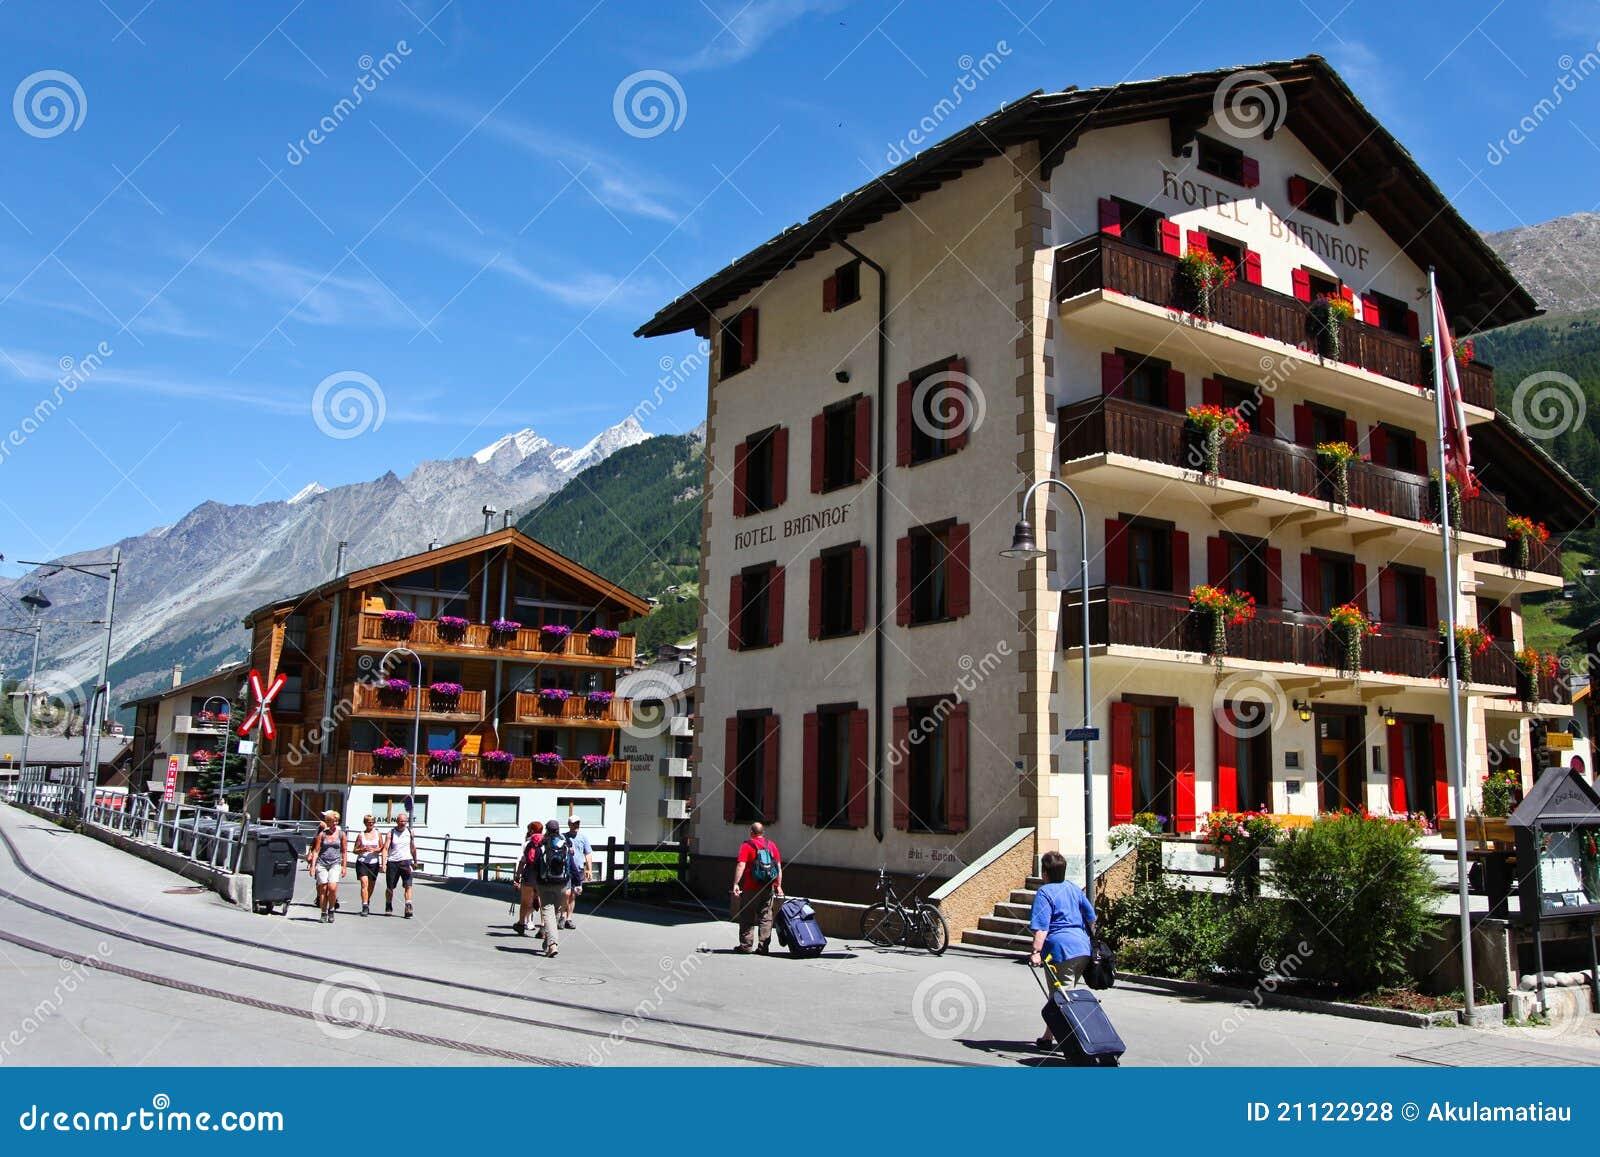 Traditional swiss hotels in zermatt switzerland editorial for Design hotel zermatt